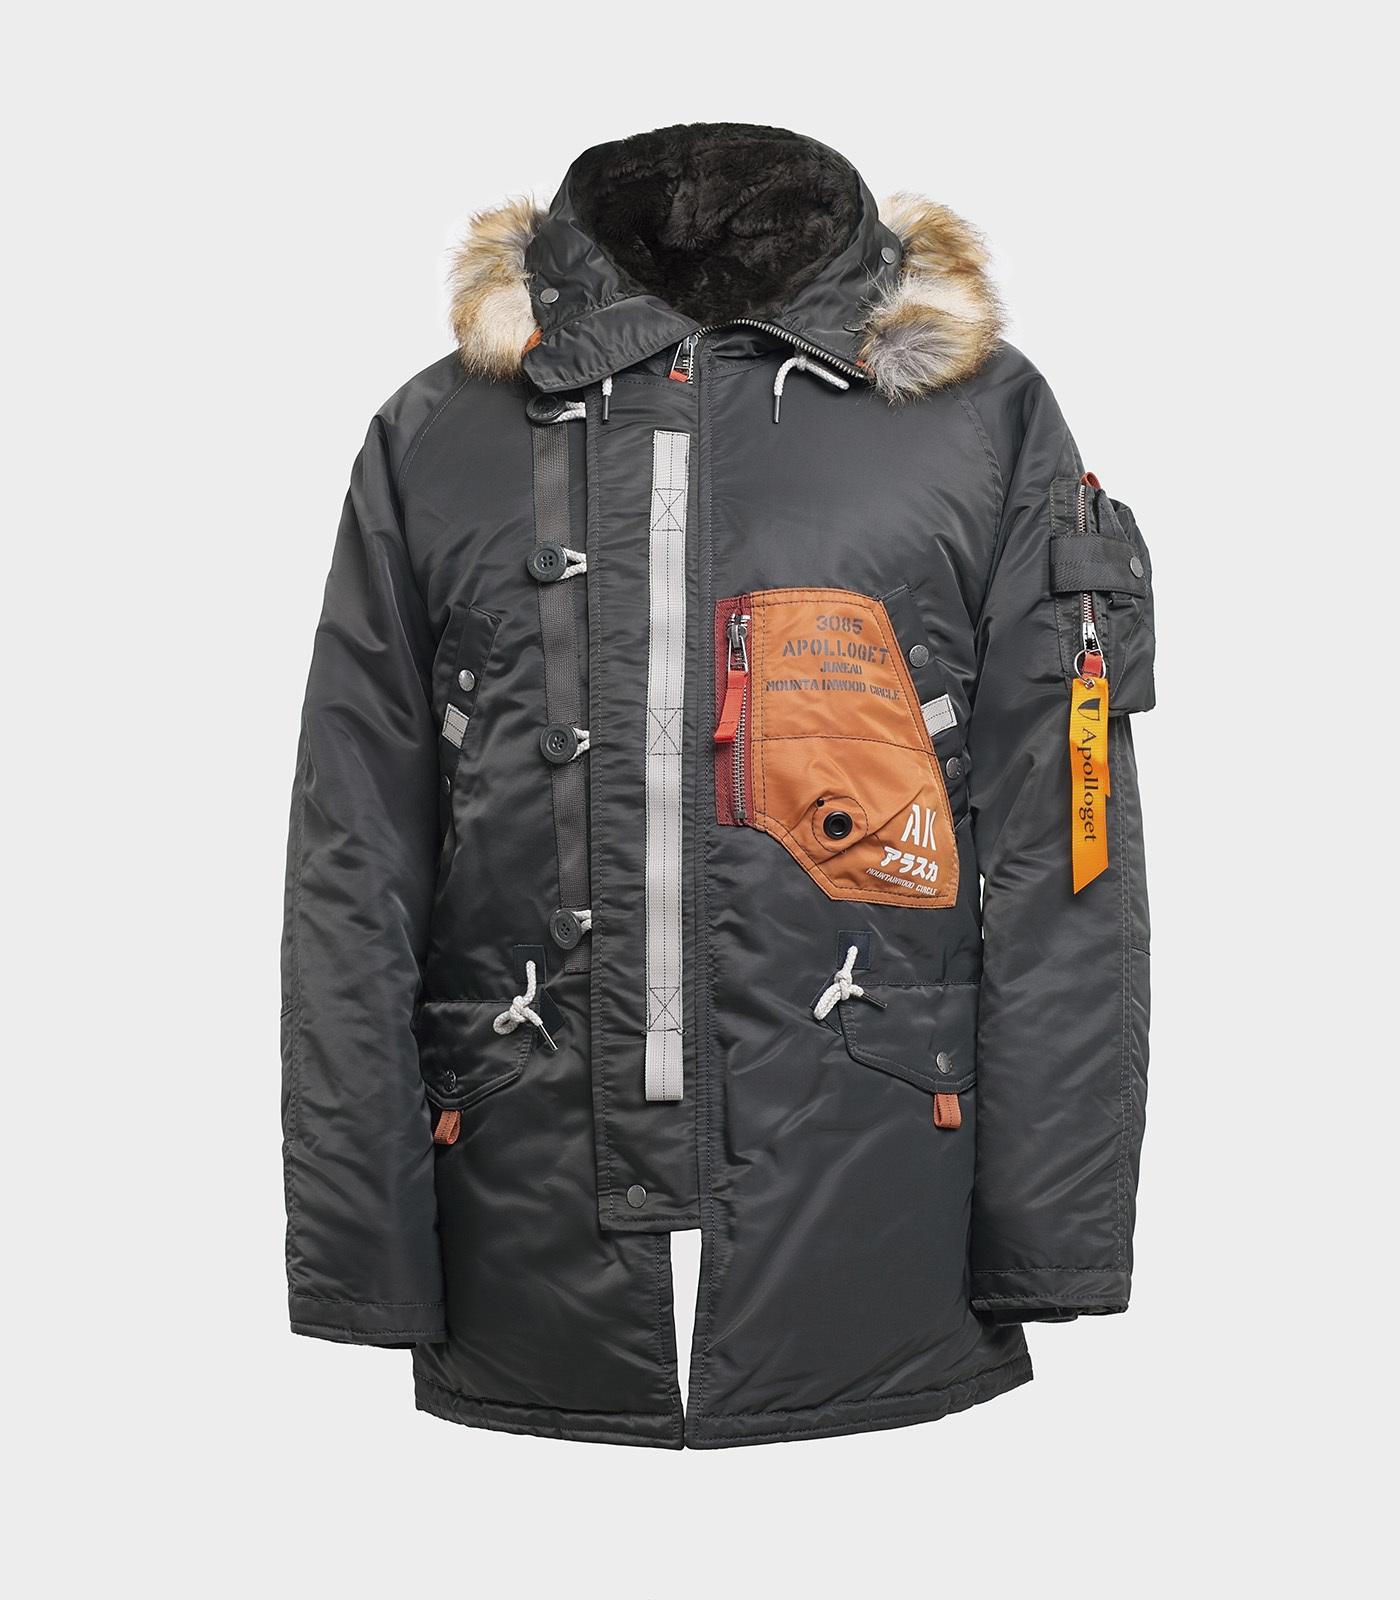 Купить зимнюю куртку